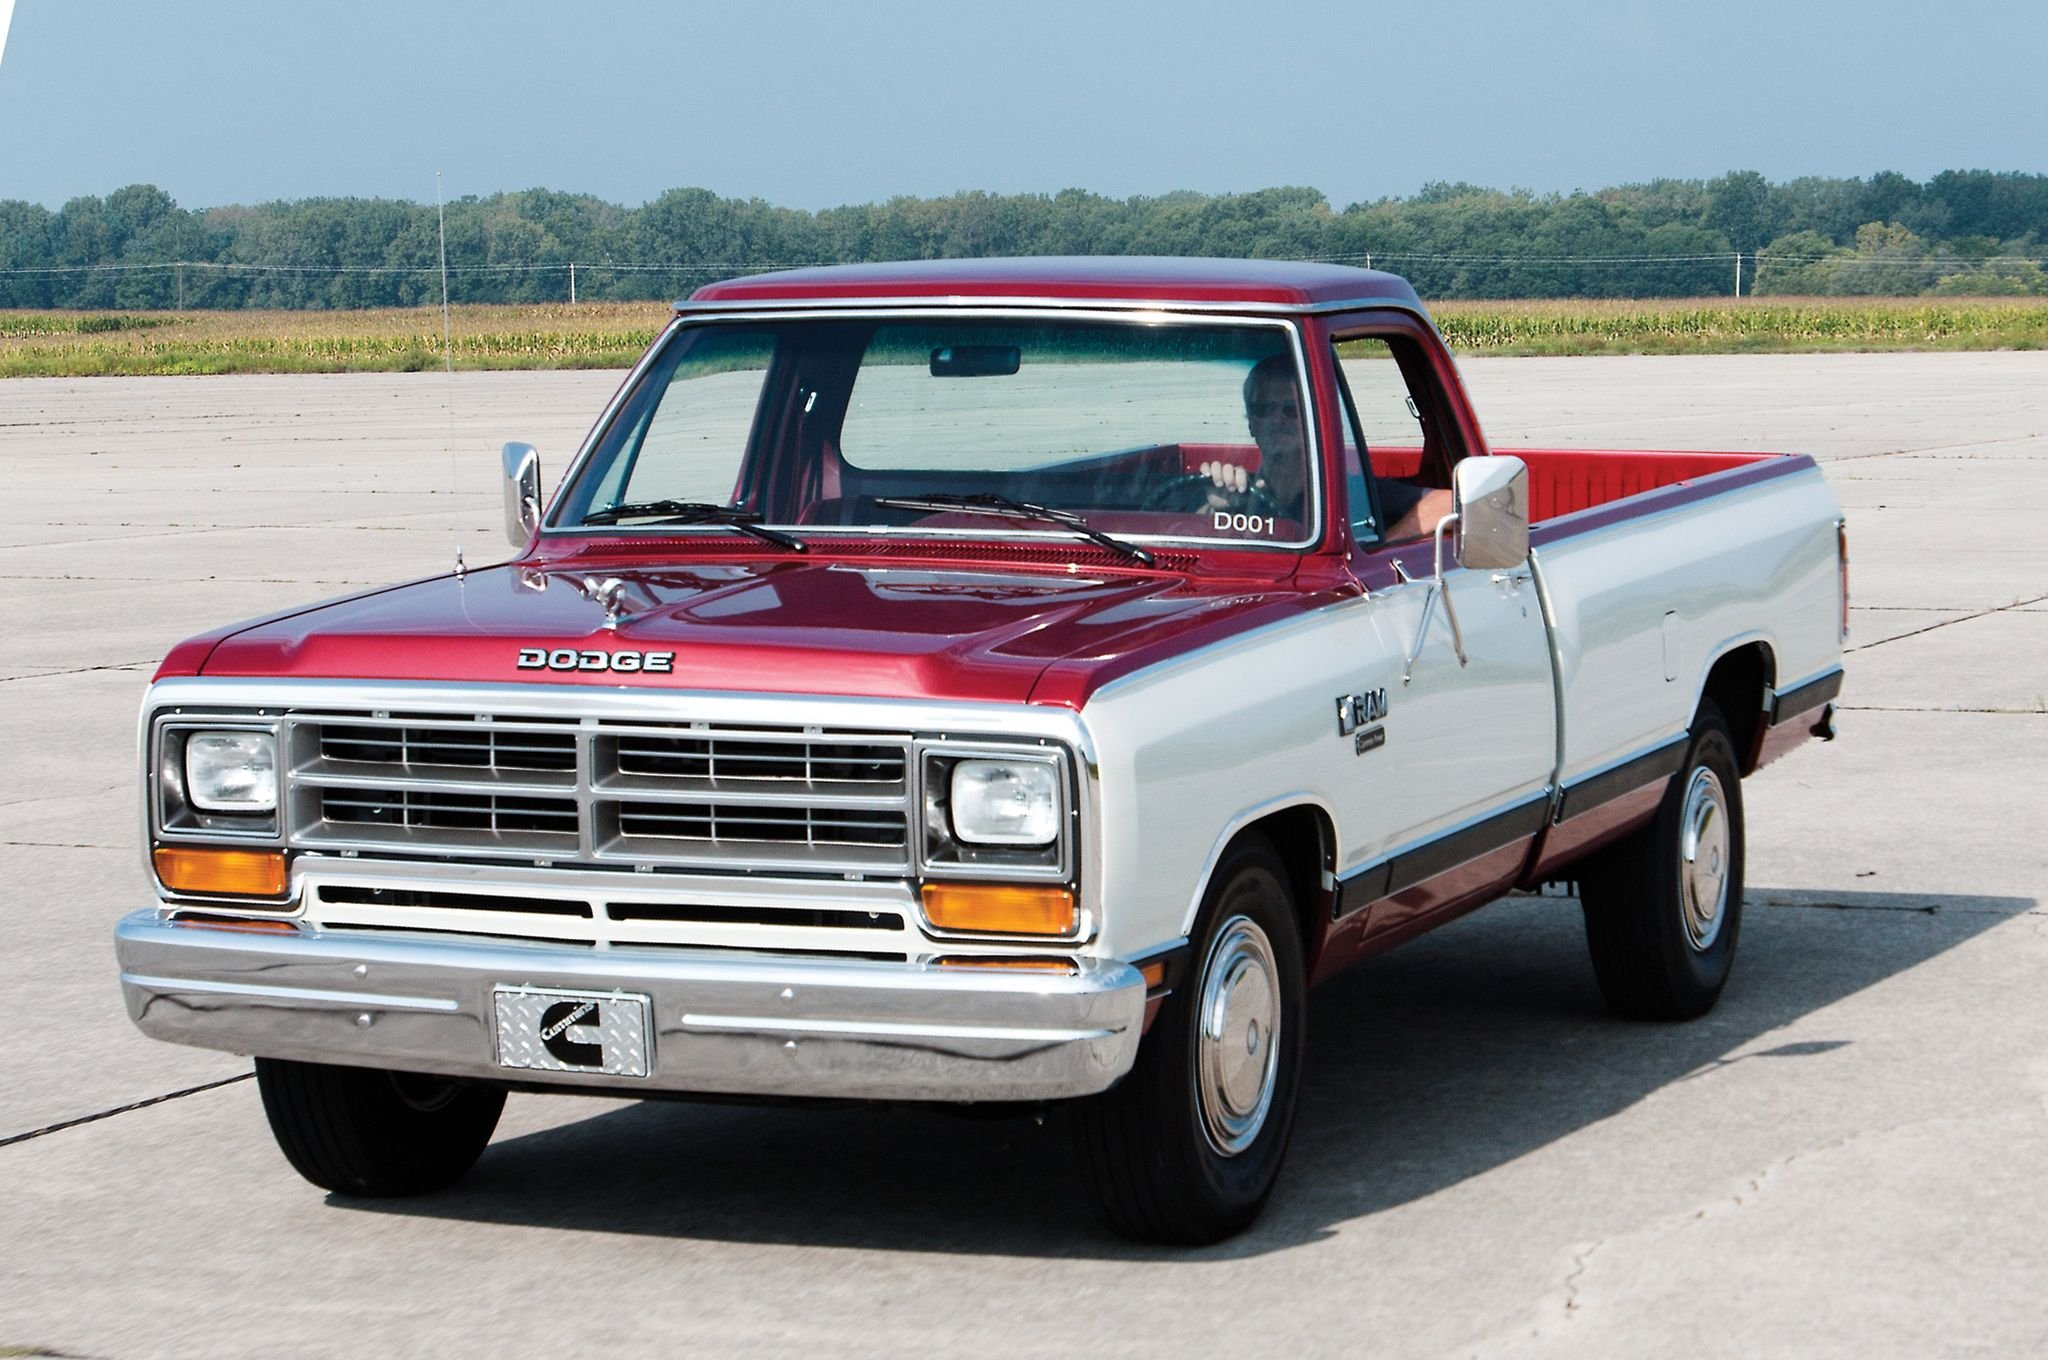 1985 Dodge Ram Cummins D001 Development Truck Pickup